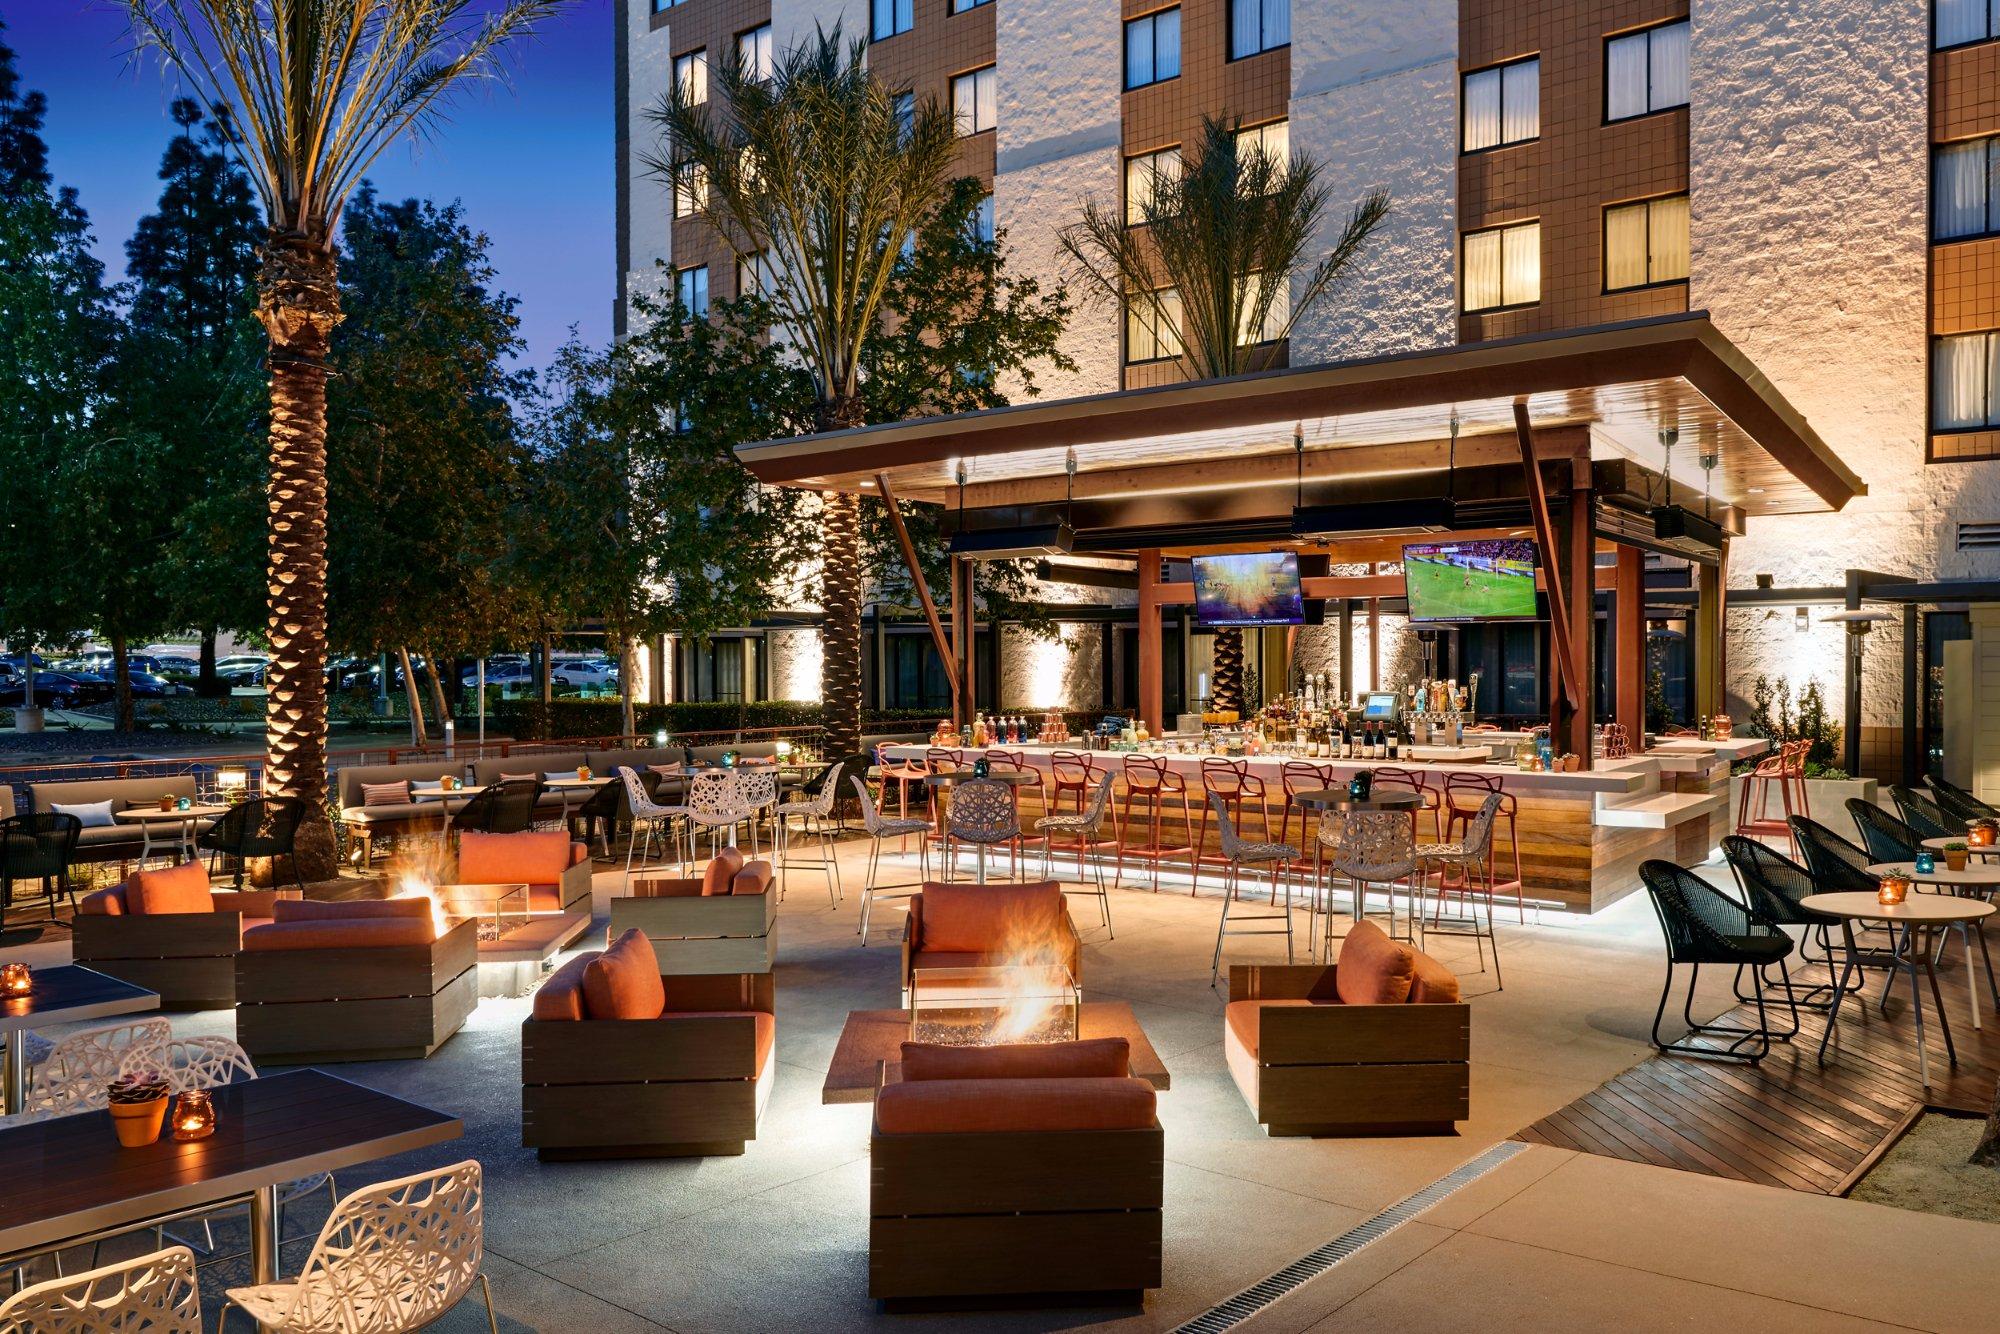 The 10 Best Restaurants Near Los Angeles Marriott Burbank Airport